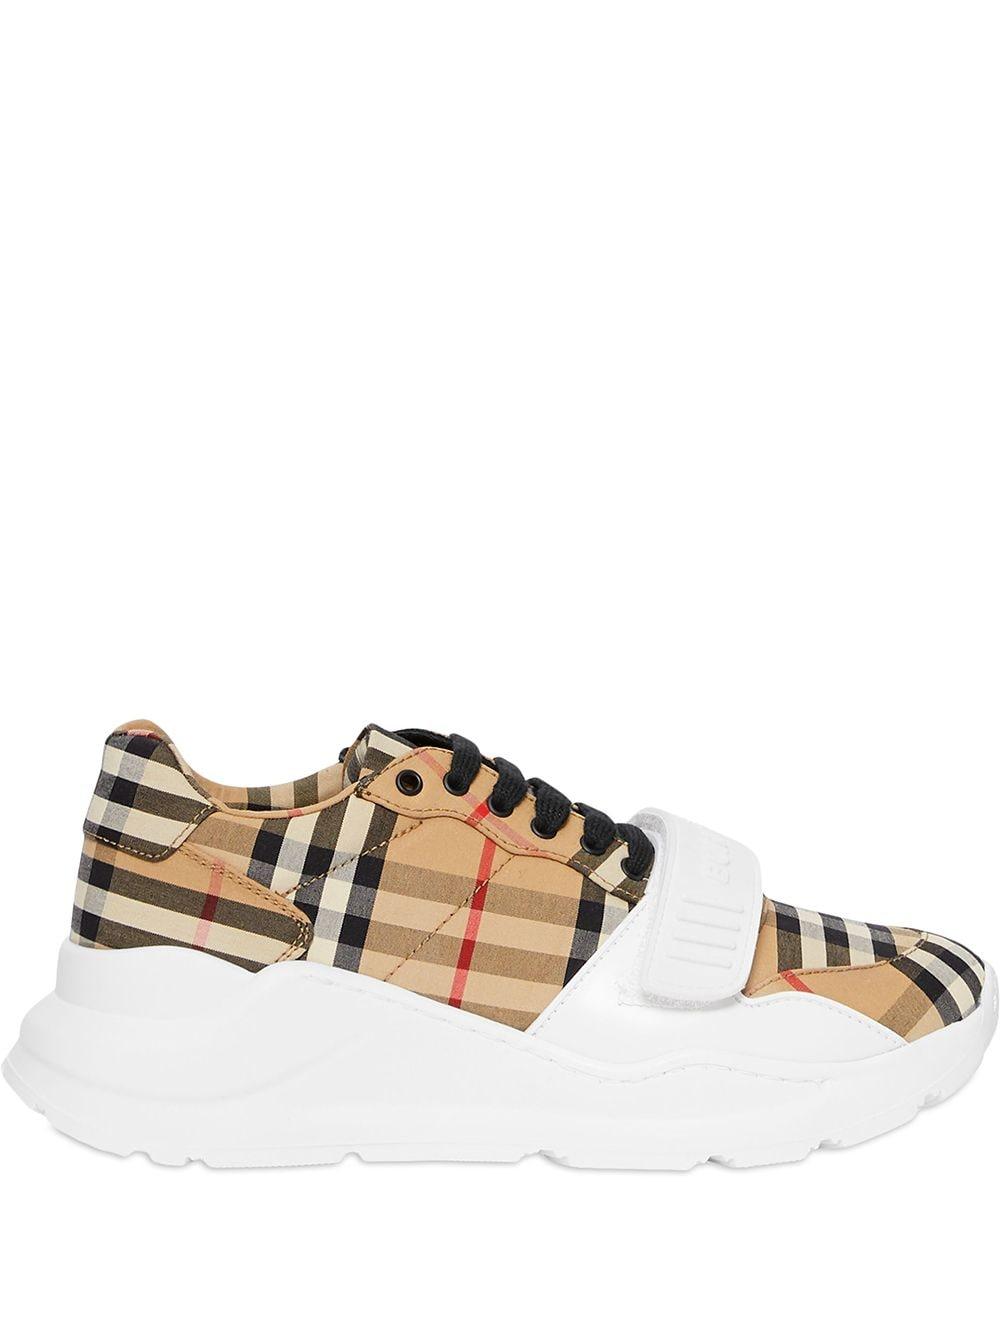 Regis Cotton Sneakers